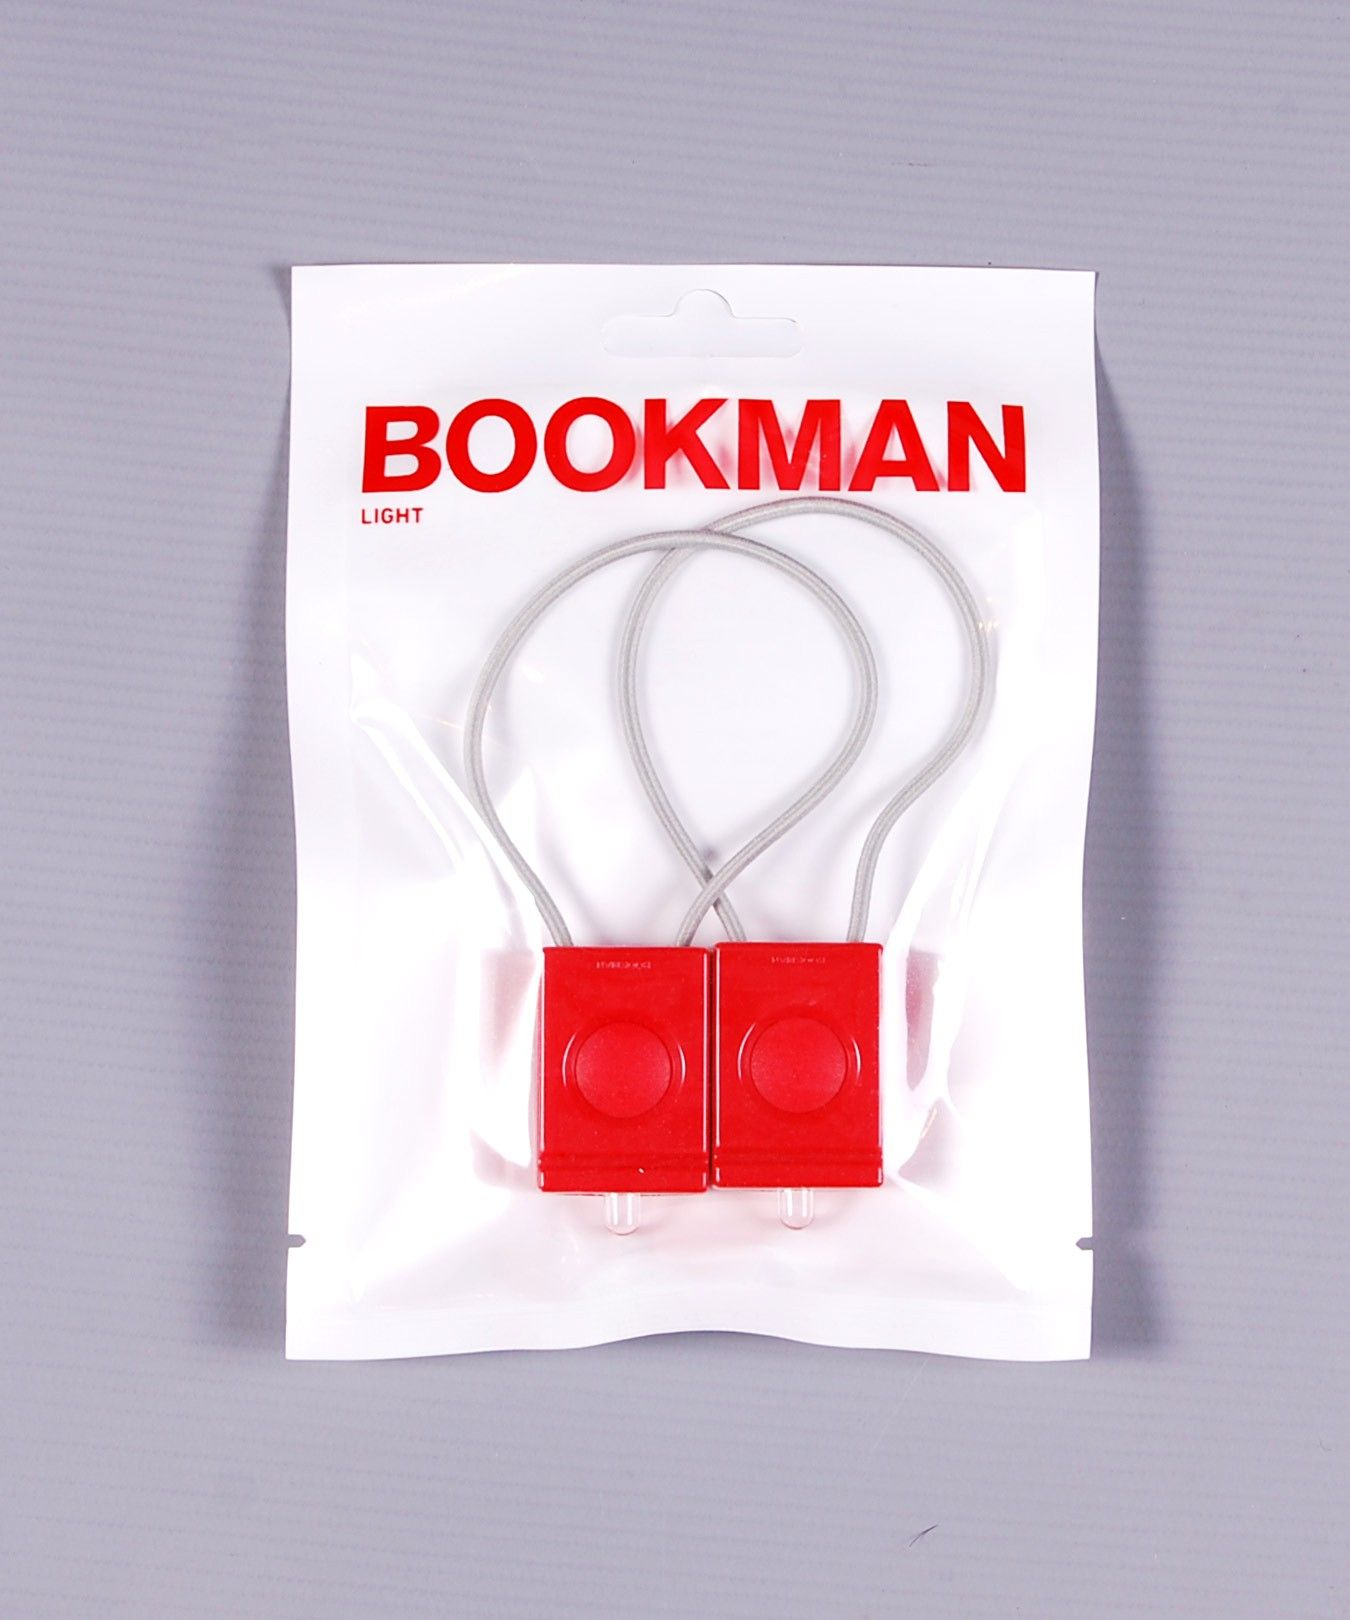 bookman-light-red-3.jpg (1350×1620)